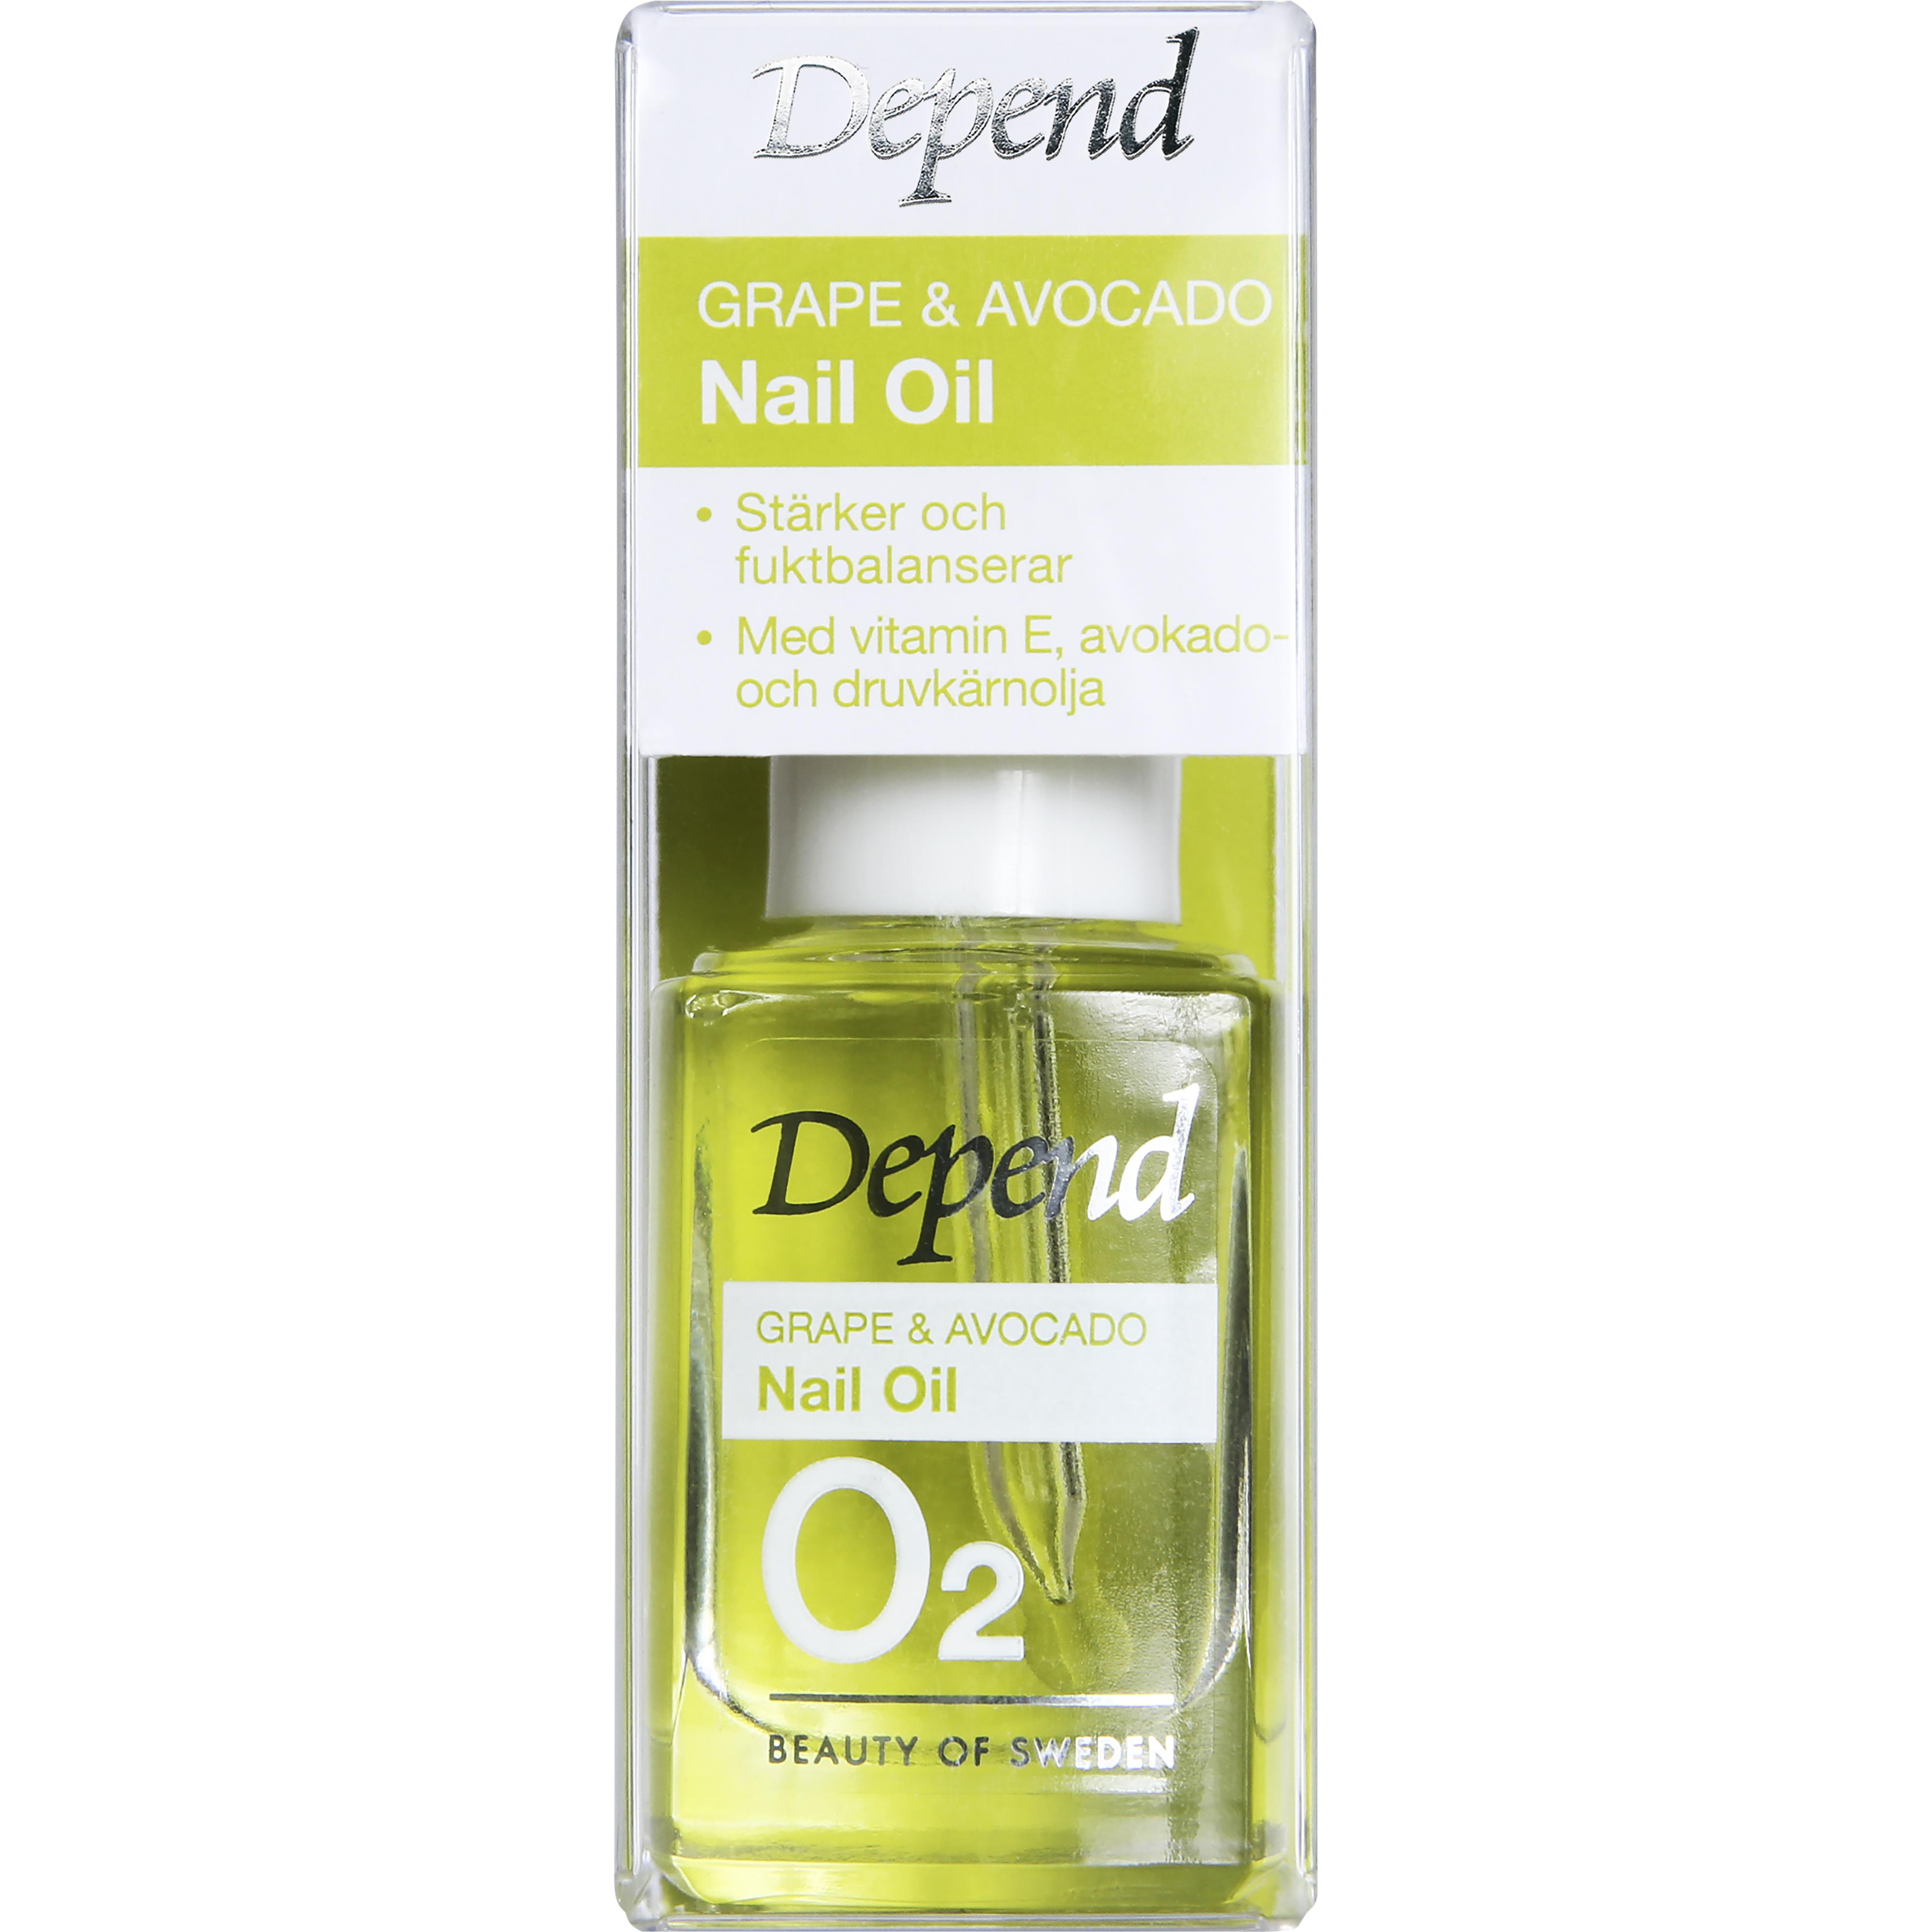 Depend Grape & Avocado Nail Oil